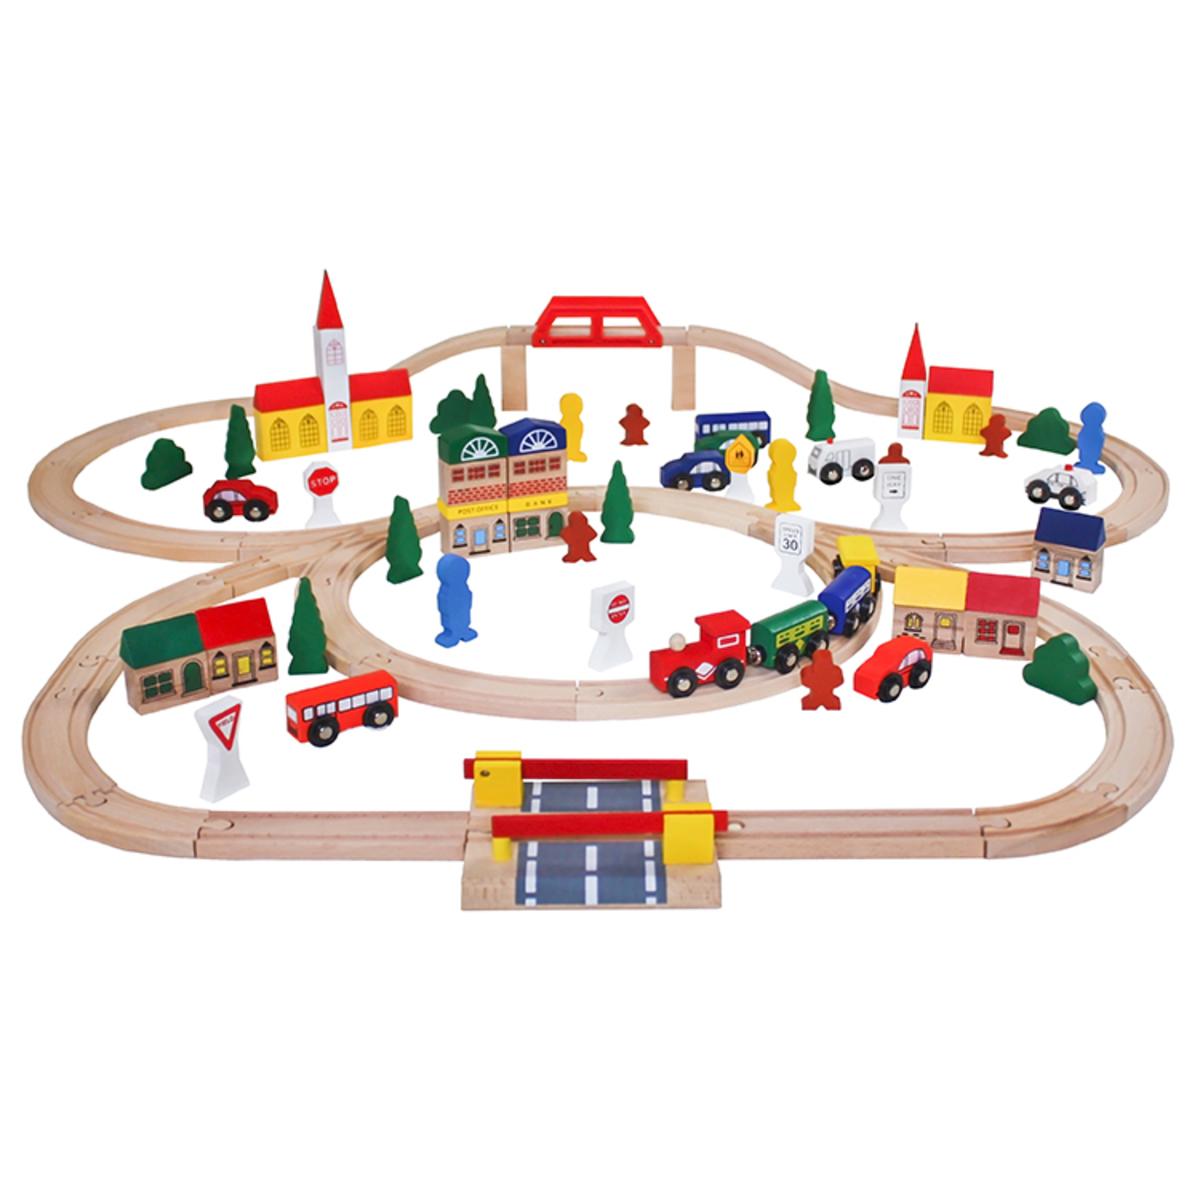 Drevená vláčkodráha - 100 prvkov Wooden train track pcs